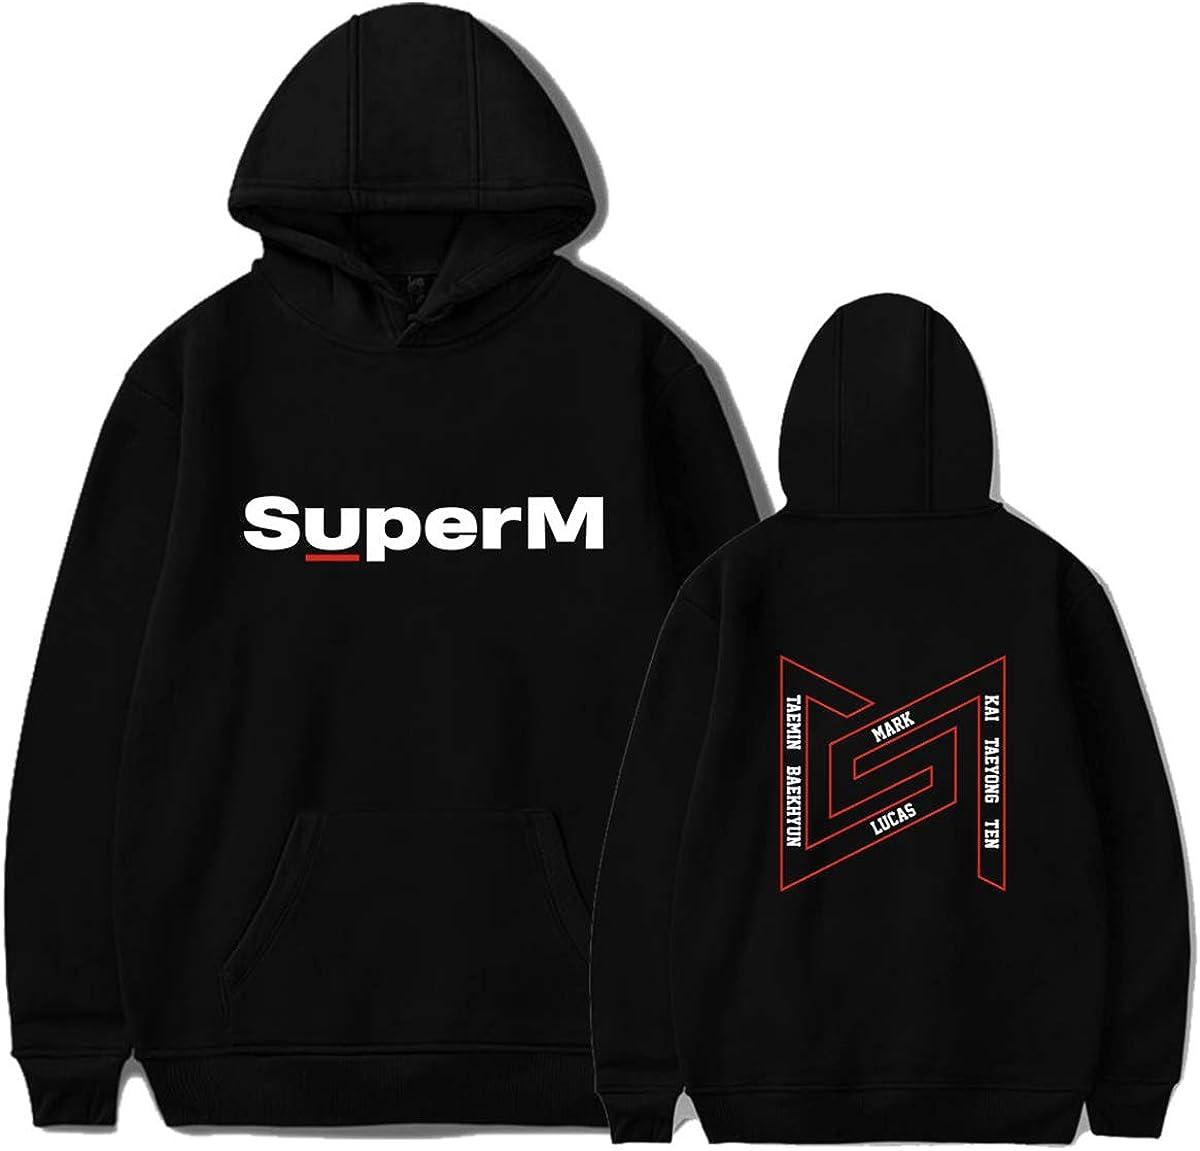 ATERAIN Kpop SuperM Hoodie Baekhyun Taeyong Mark Sweatshirt Ablum Pullover